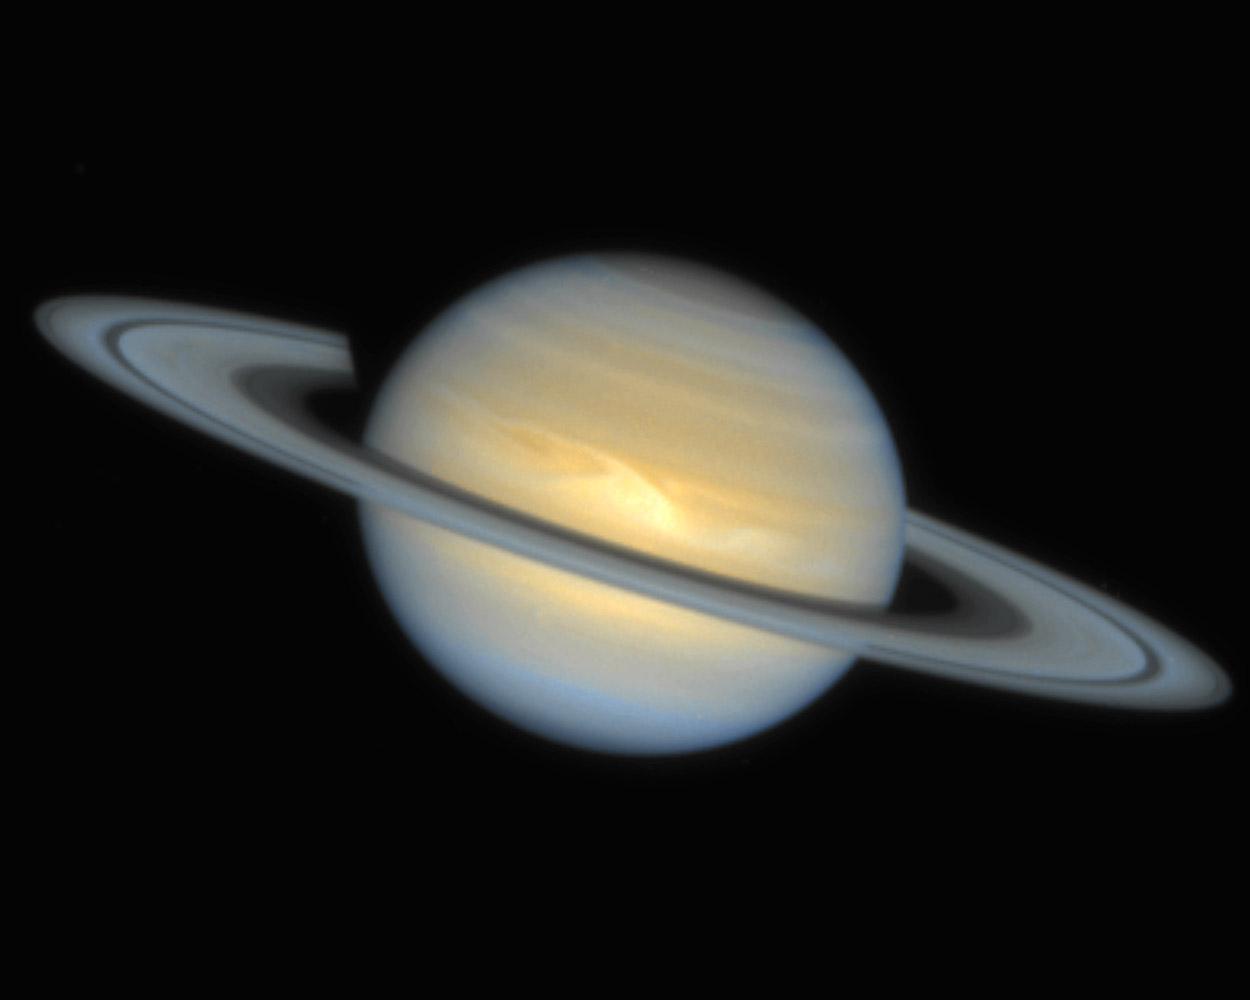 gambar planet hubble - photo #23